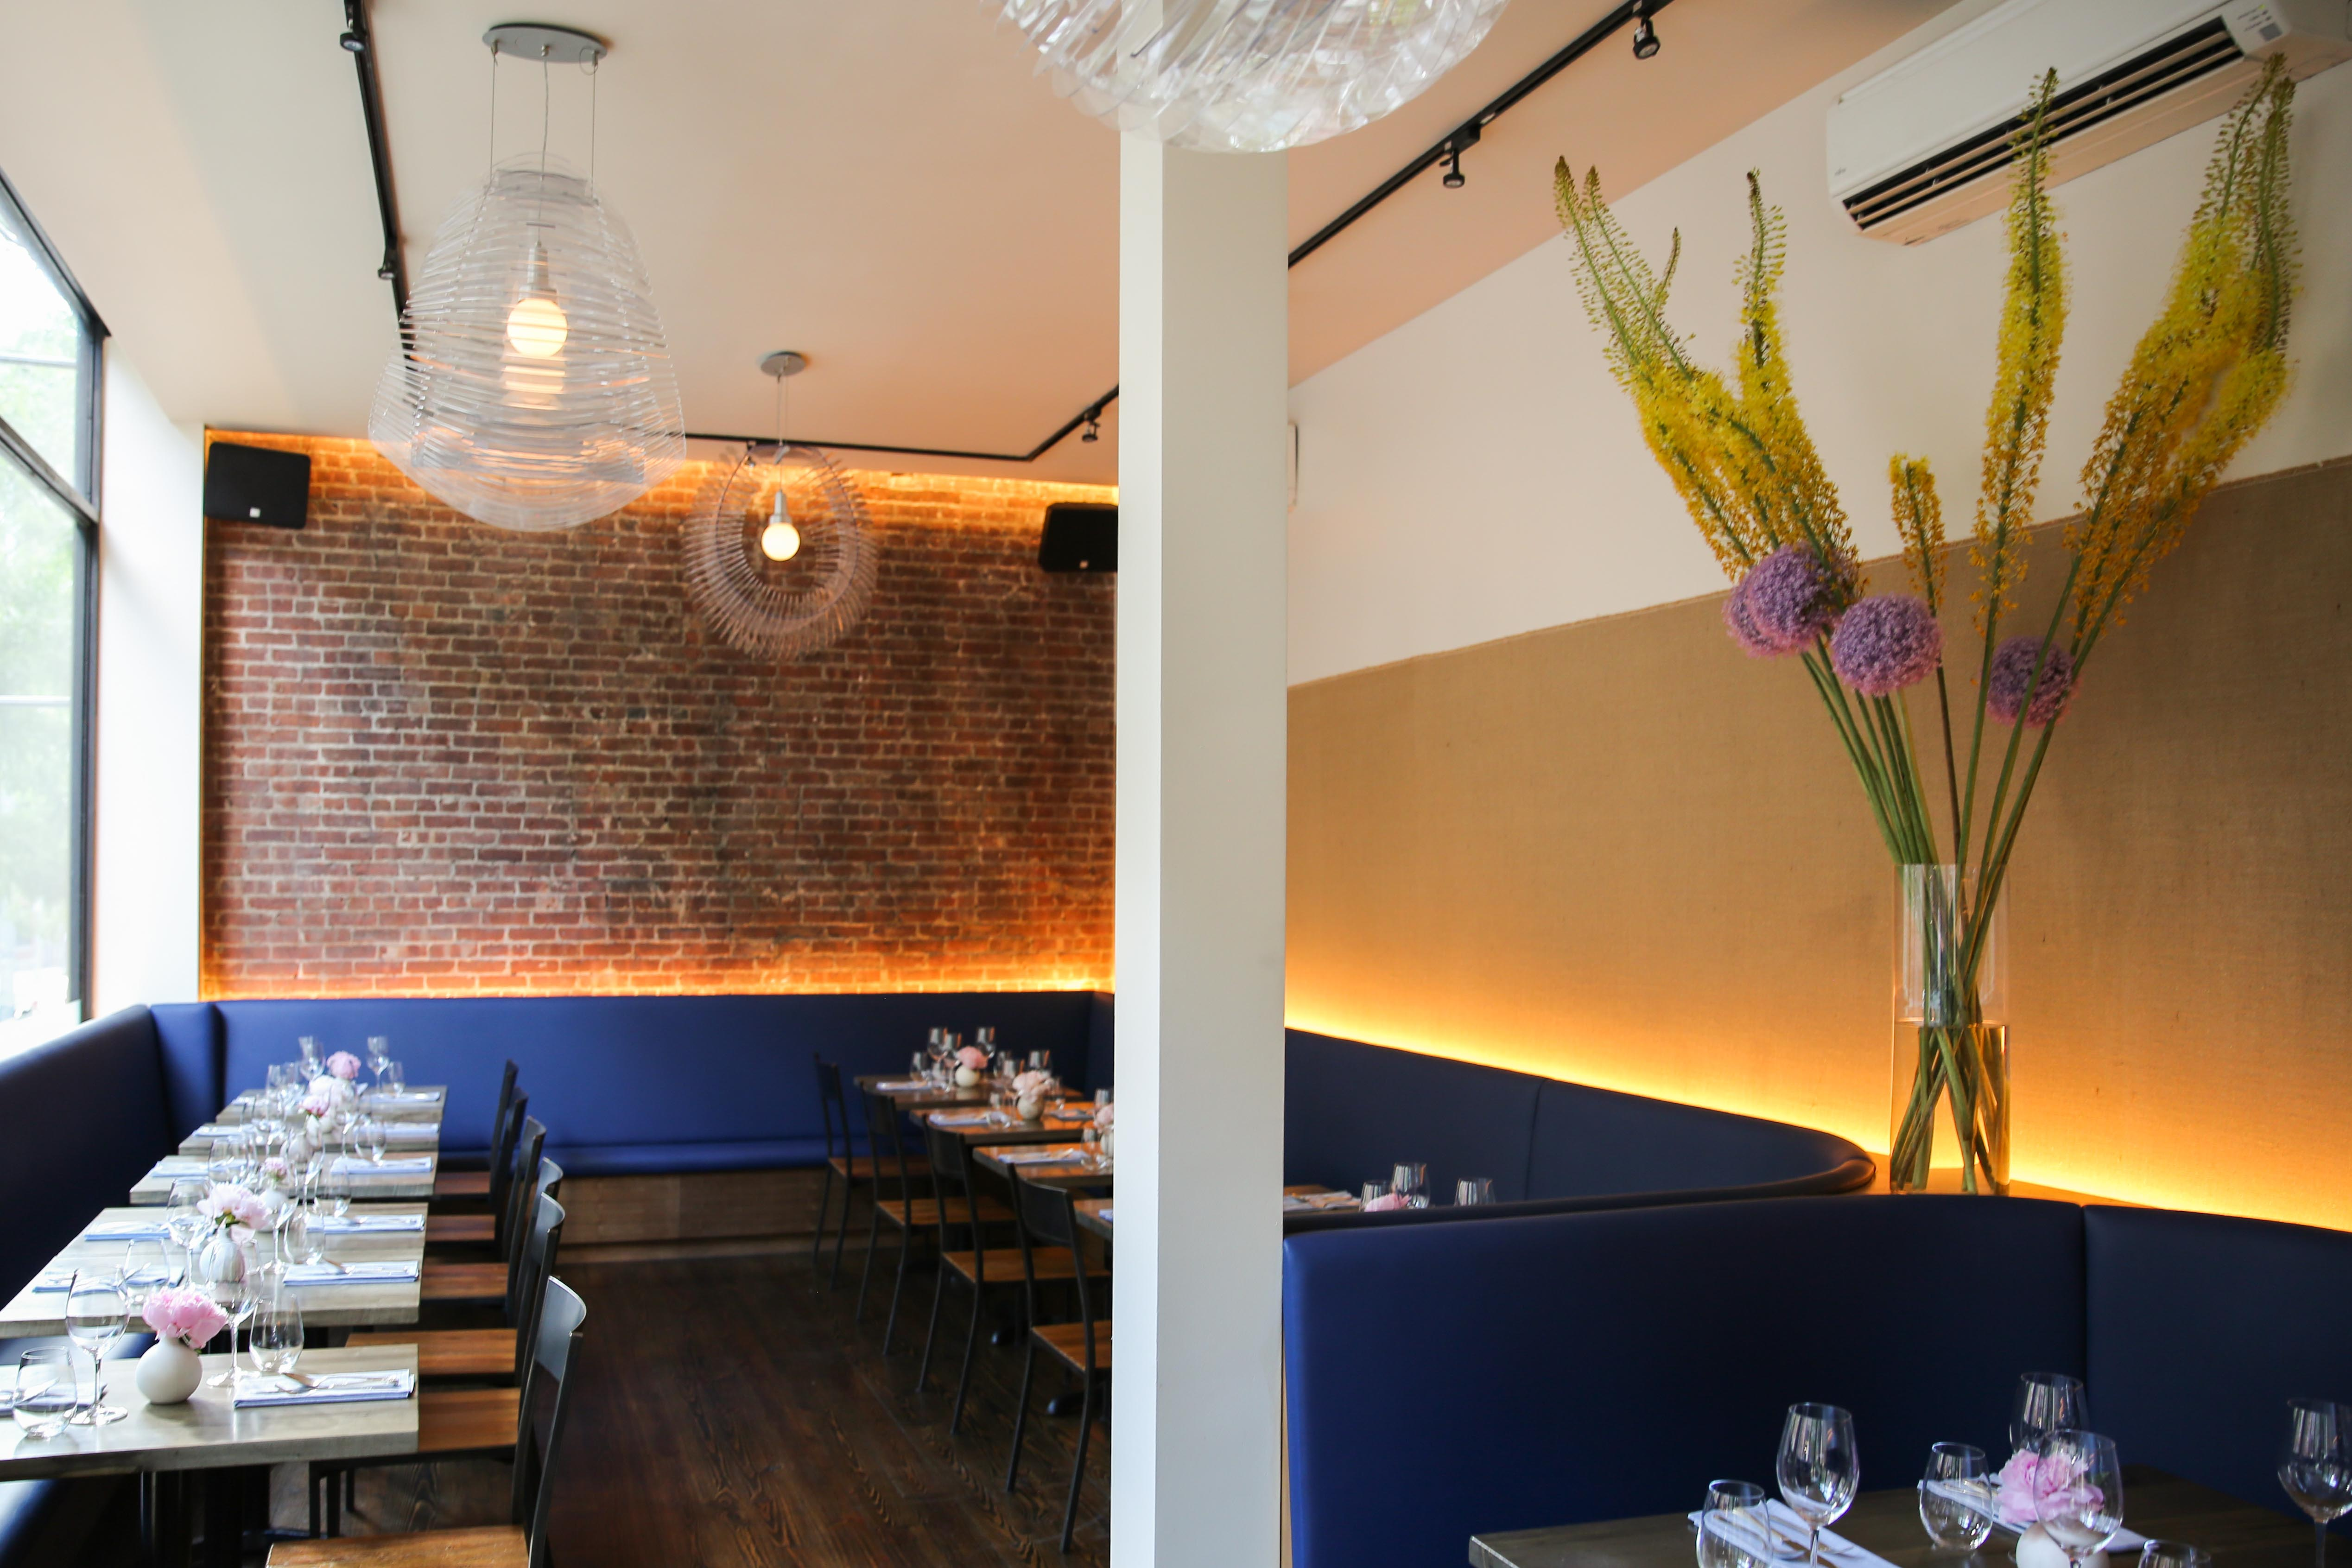 Http Ny Eater Com Maps Best New Brooklyn Restaurants Heatmap